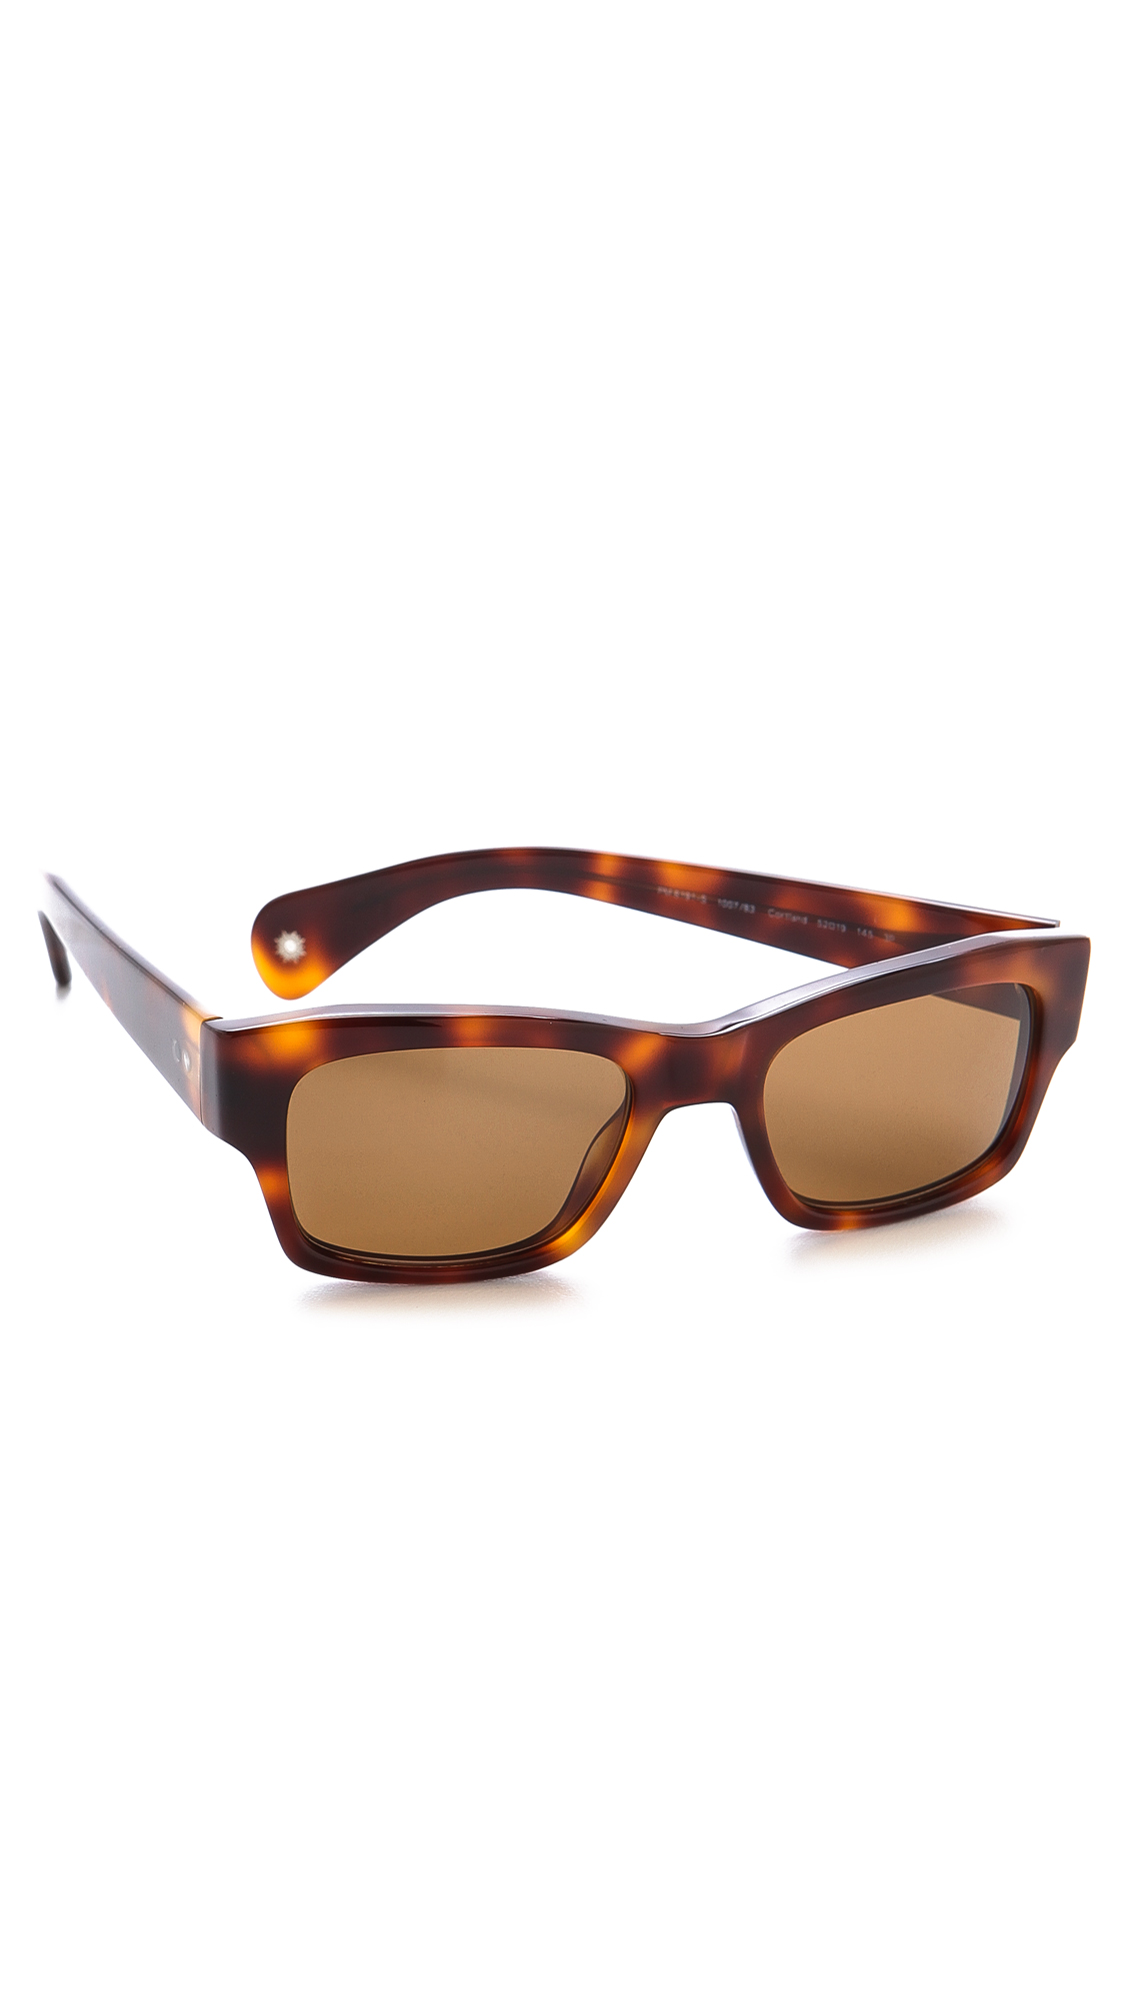 Lyst Paul Smith Cortland Polarized Sunglasses In Brown